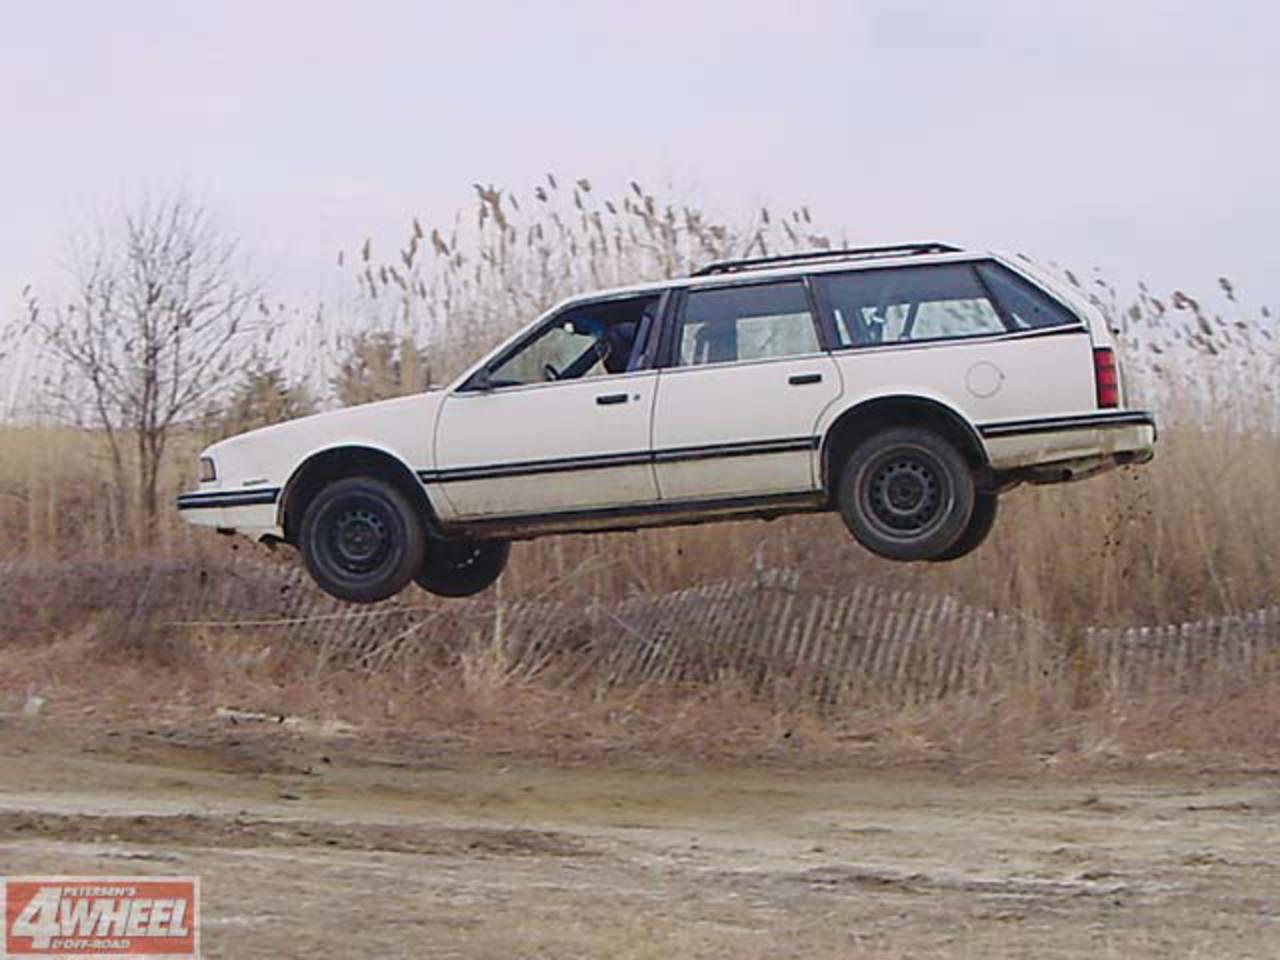 All Chevy 1990 Chevrolet Celebrity Wagon Topworldauto Photos Of Photo